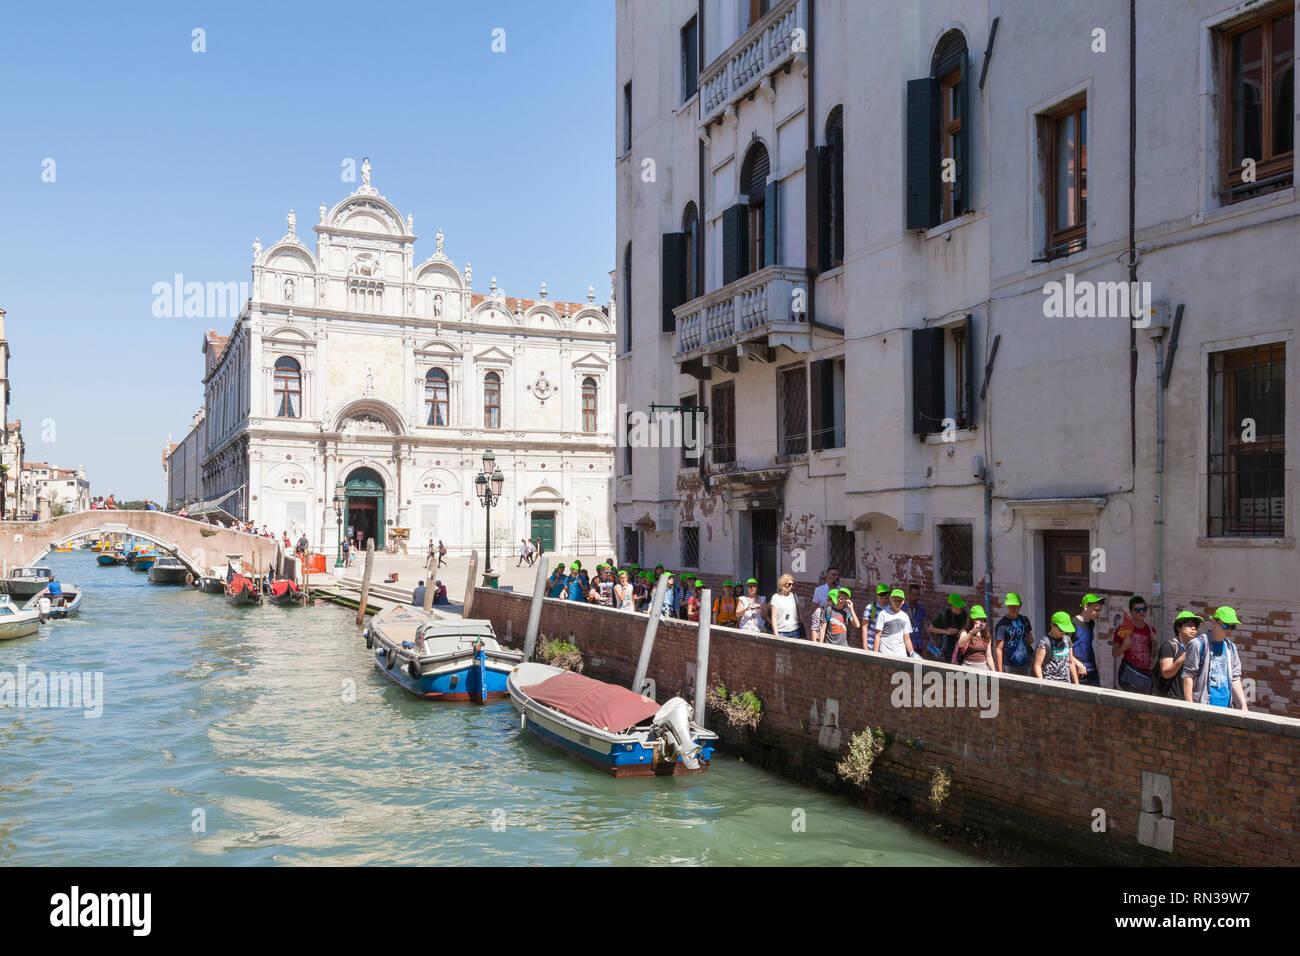 Tour group walking through Castello, Venice, Italy on a  canal in front of Campo dei Santi Giovanni e Paolo and Scuola Grande di San Marco - Stock Image